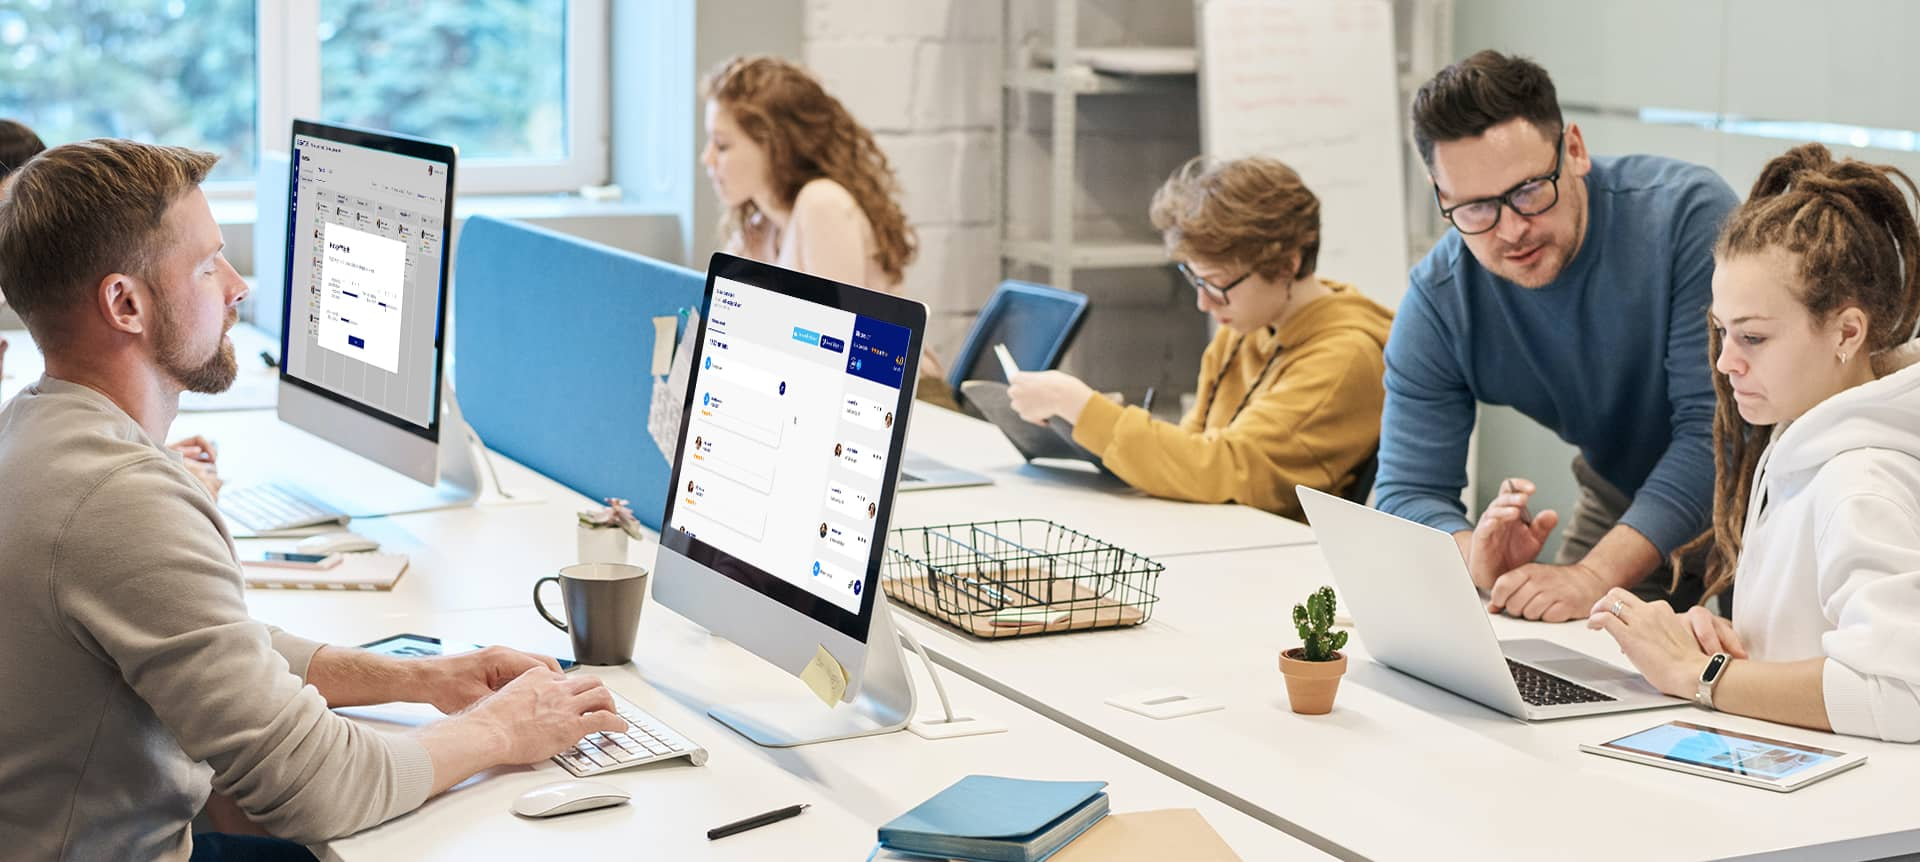 An HR team using recruitment software together